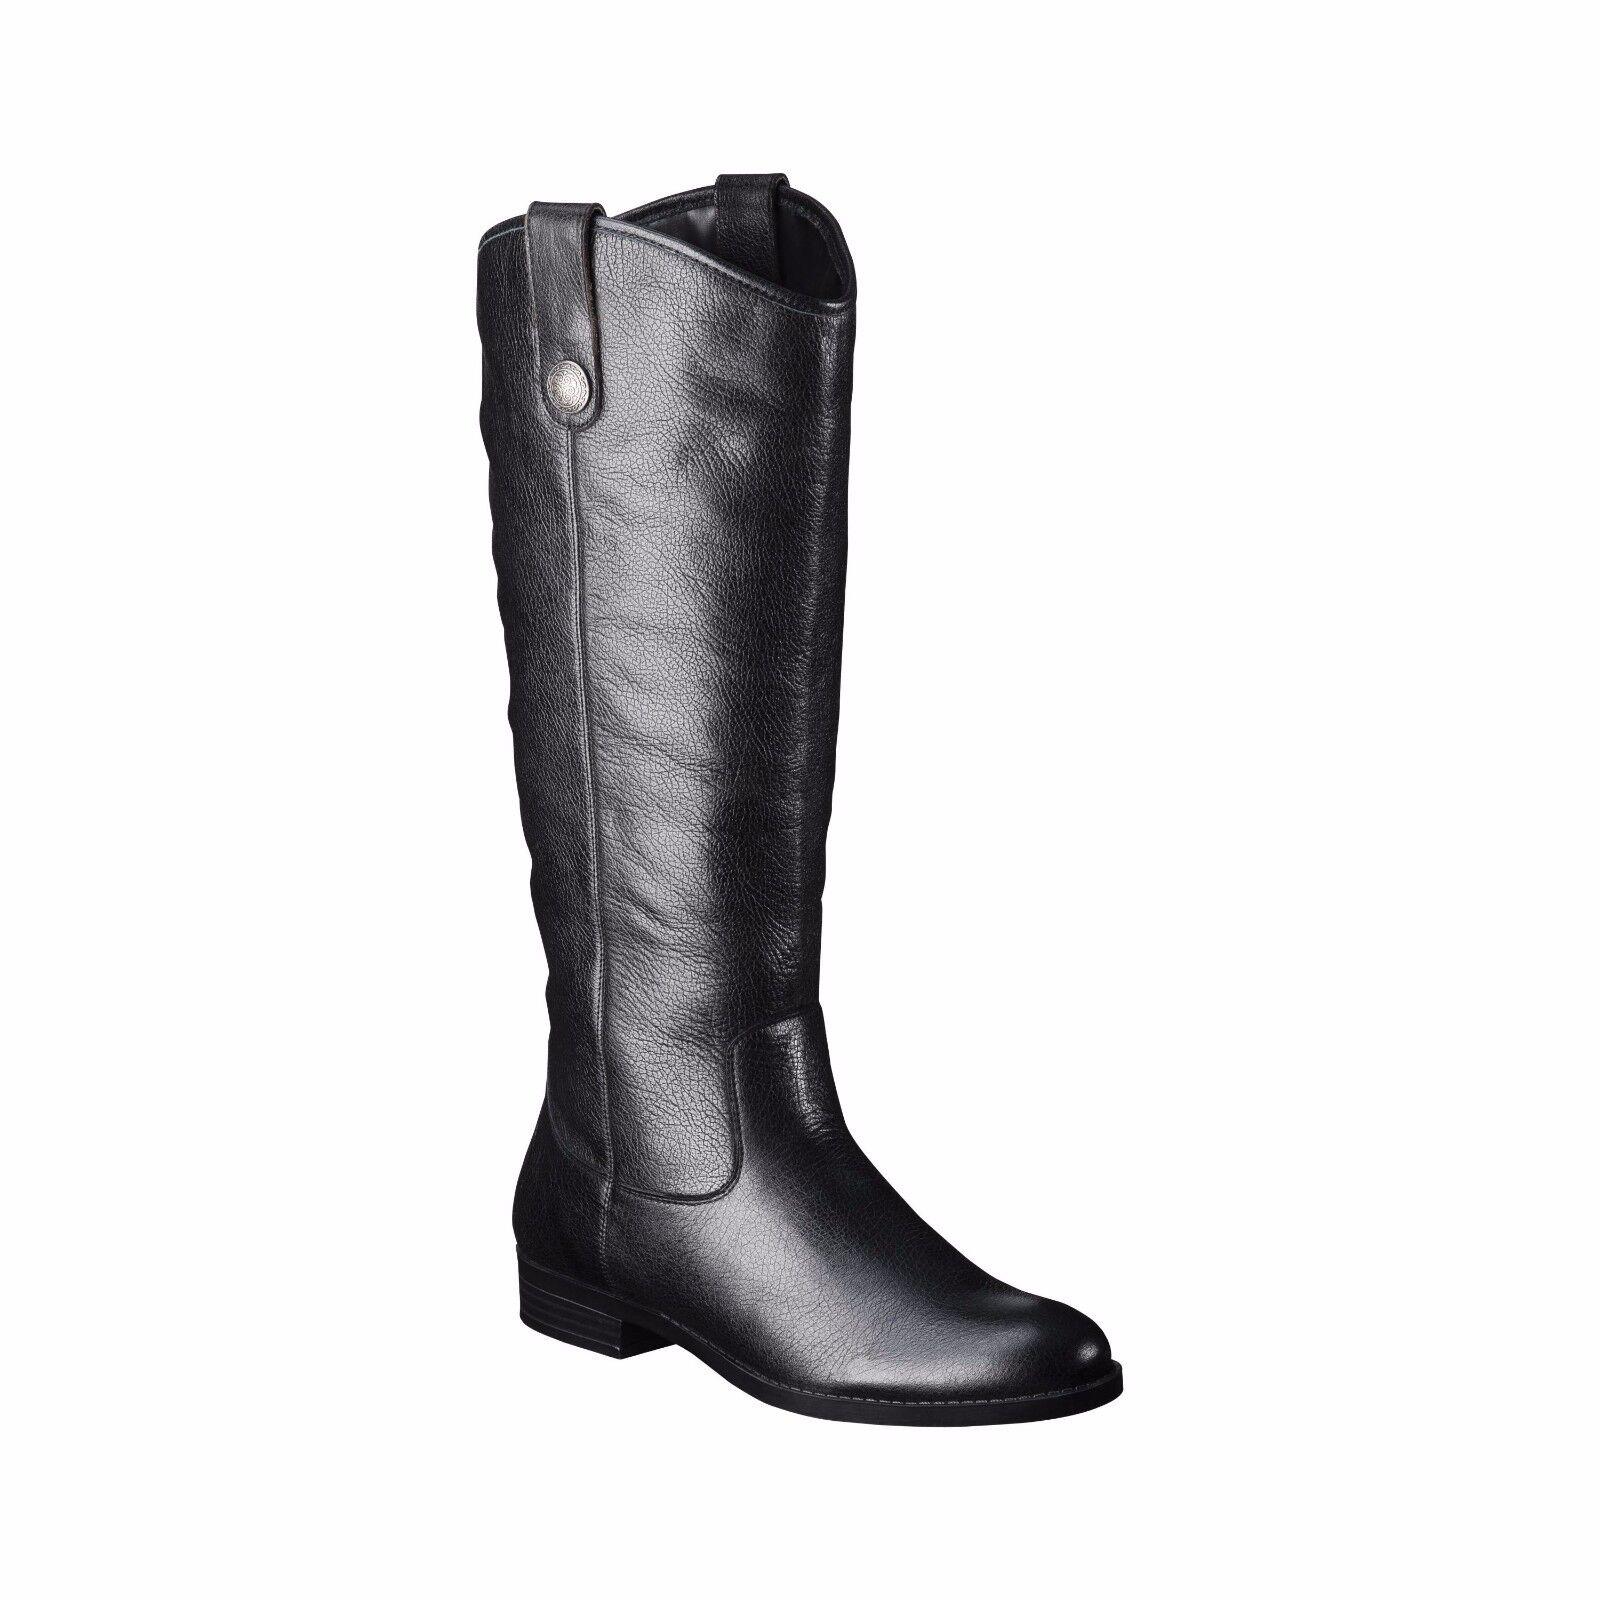 Brand New Women's Kasia Genuine Leather Riding Boots - Merona NWT(G)